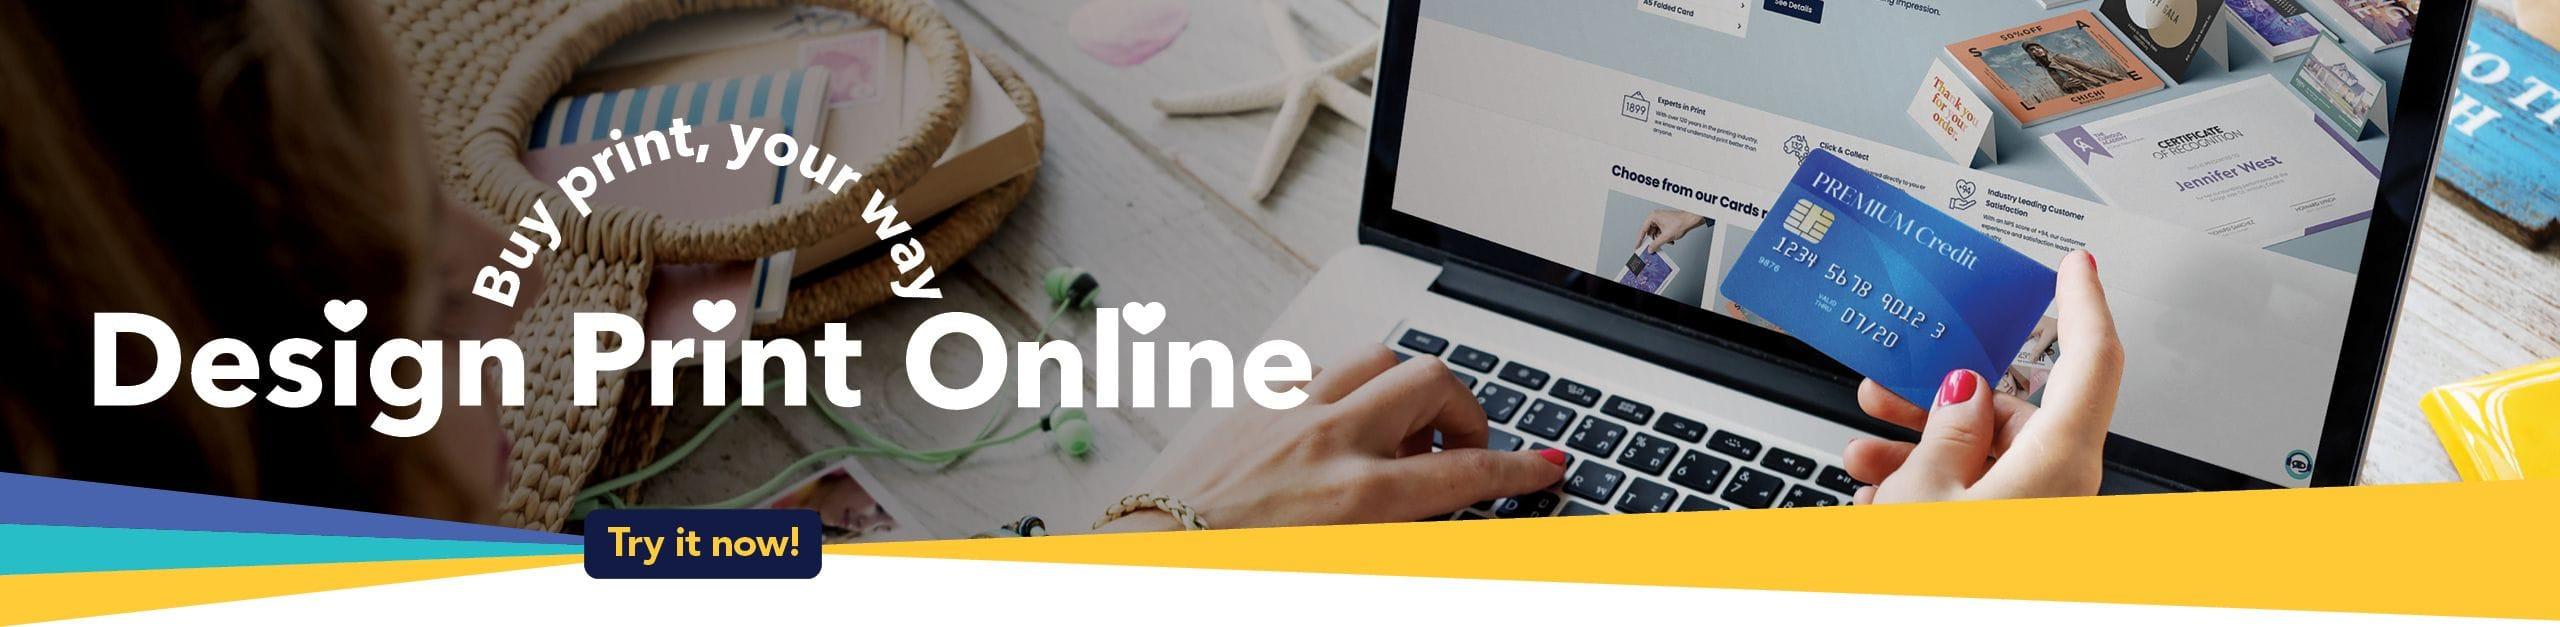 Snap Online Print & Design Services